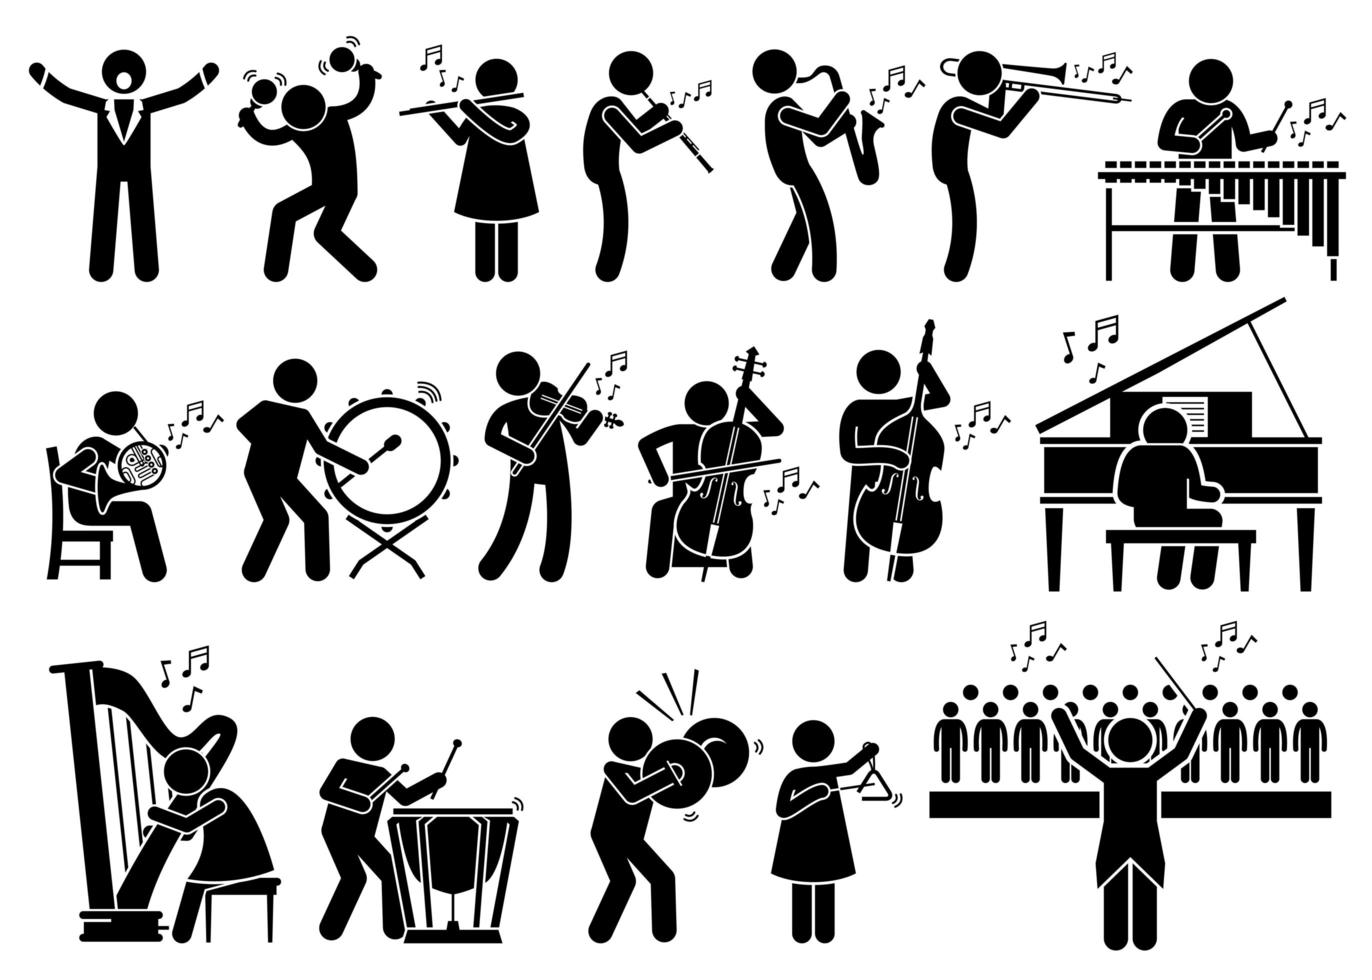 orkester symfonimusikanter med musikinstrument streckfigur piktogram ikoner. vektor